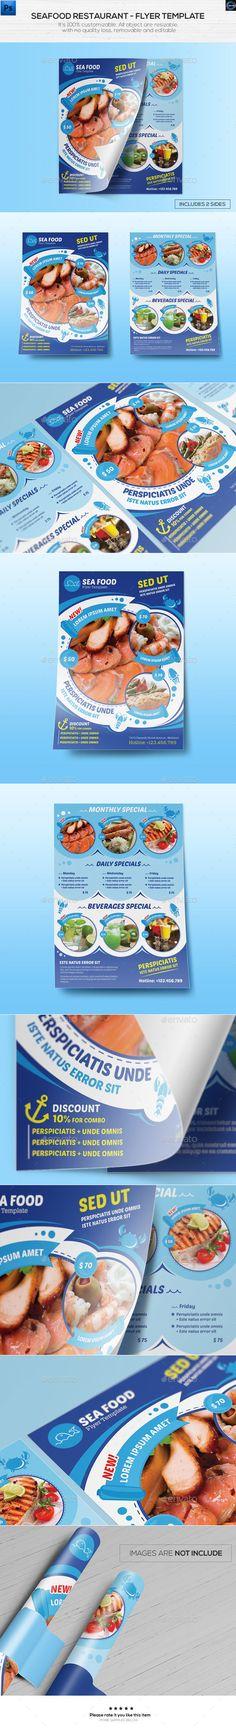 Seafood Restaurant - Flyer Template